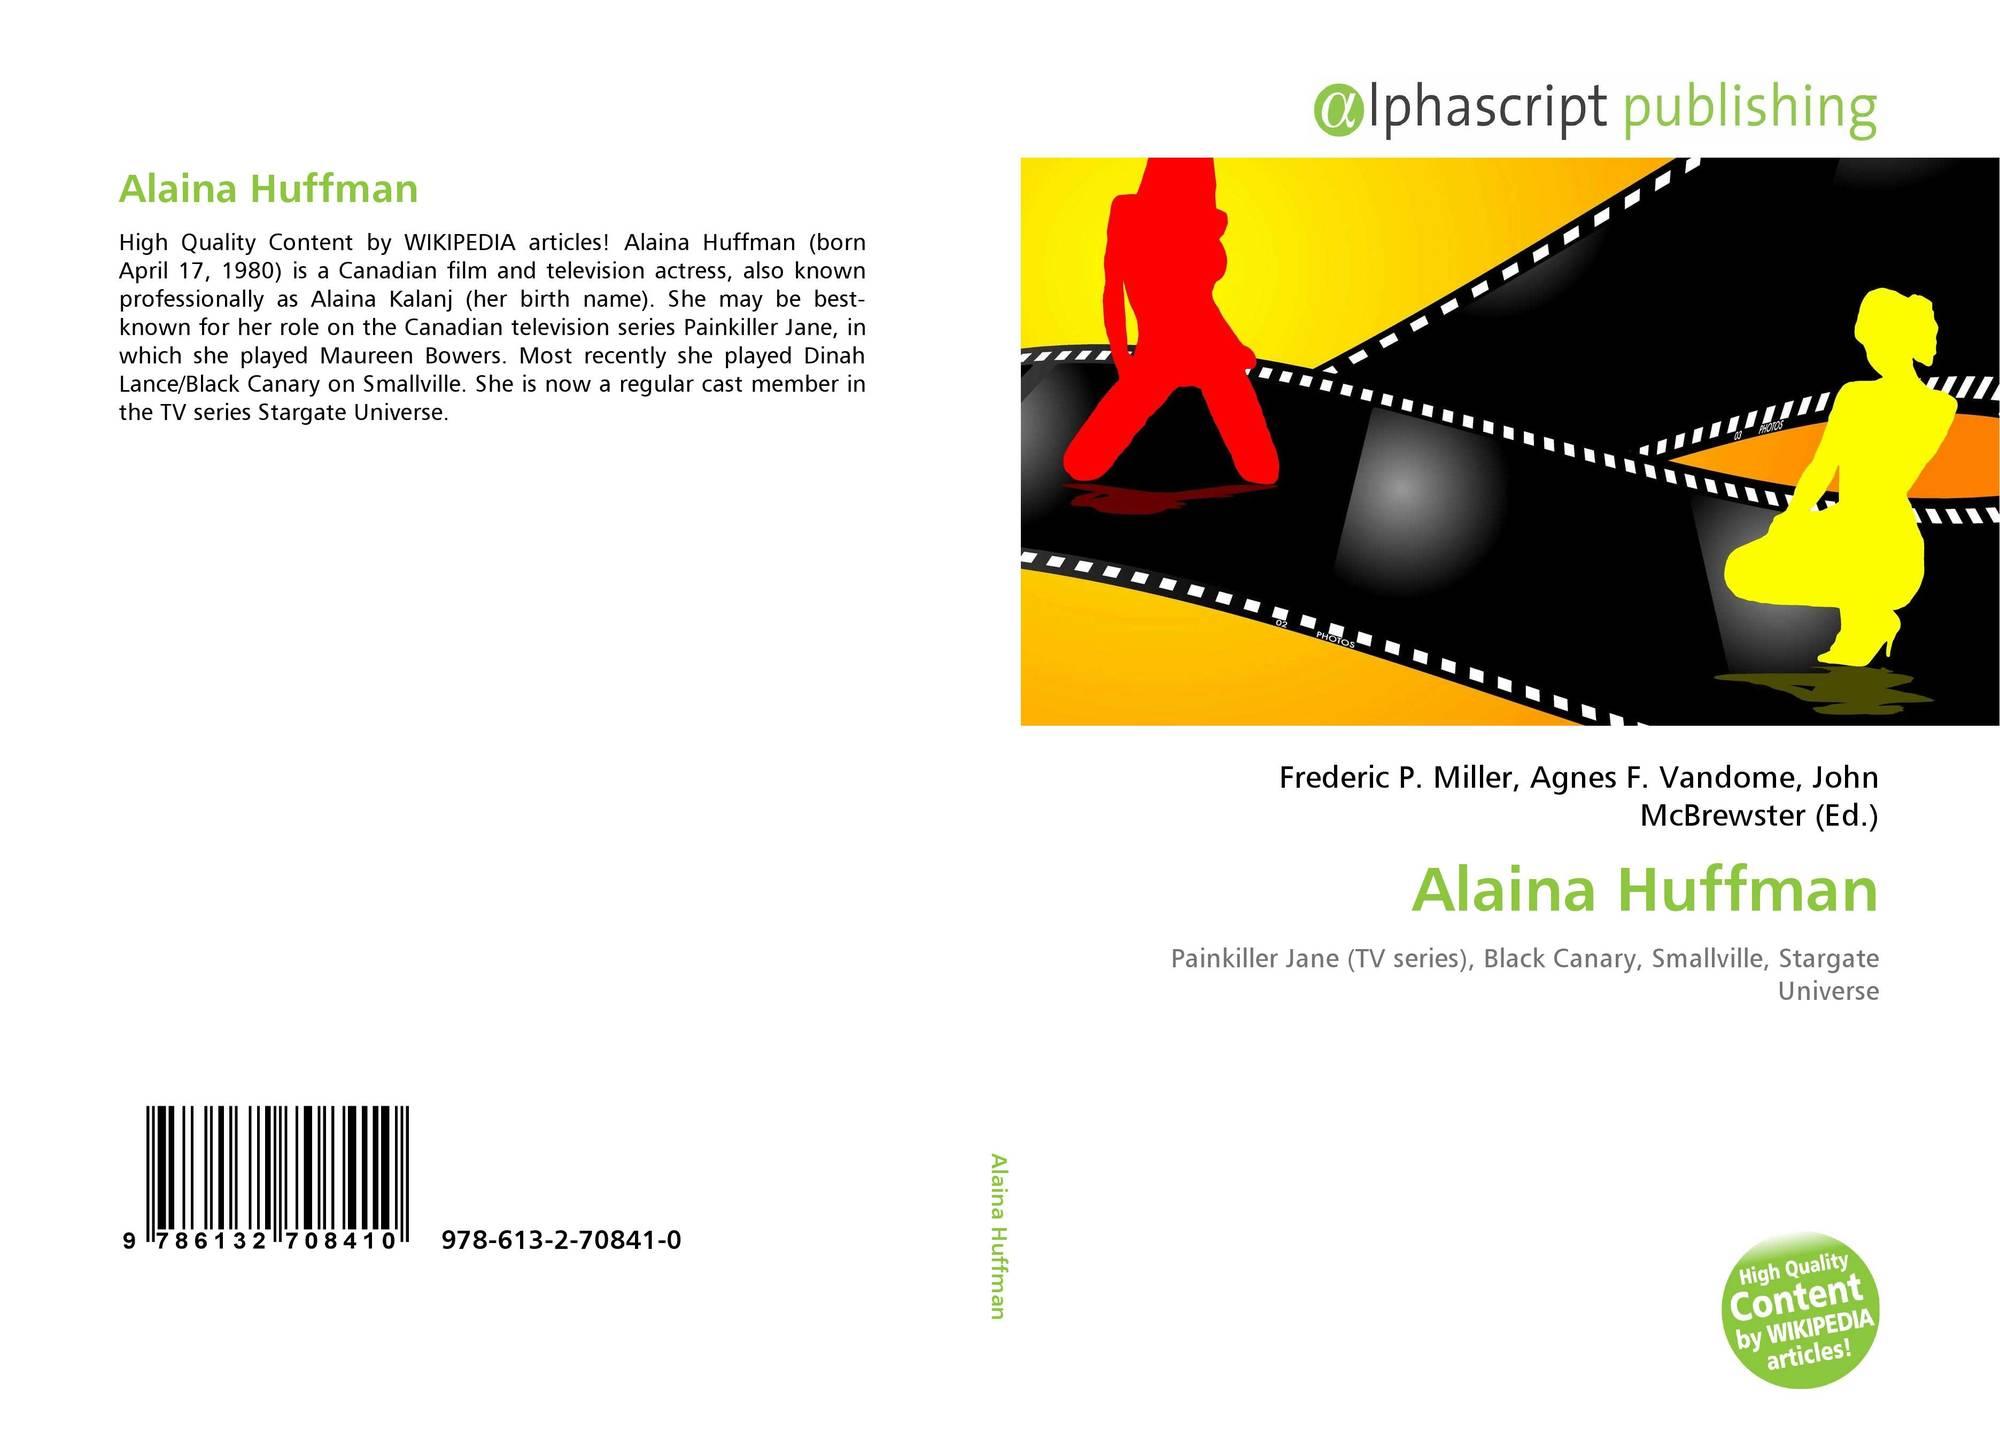 Communication on this topic: Olivia Culpo, maricar-de-mesa-b-1980/